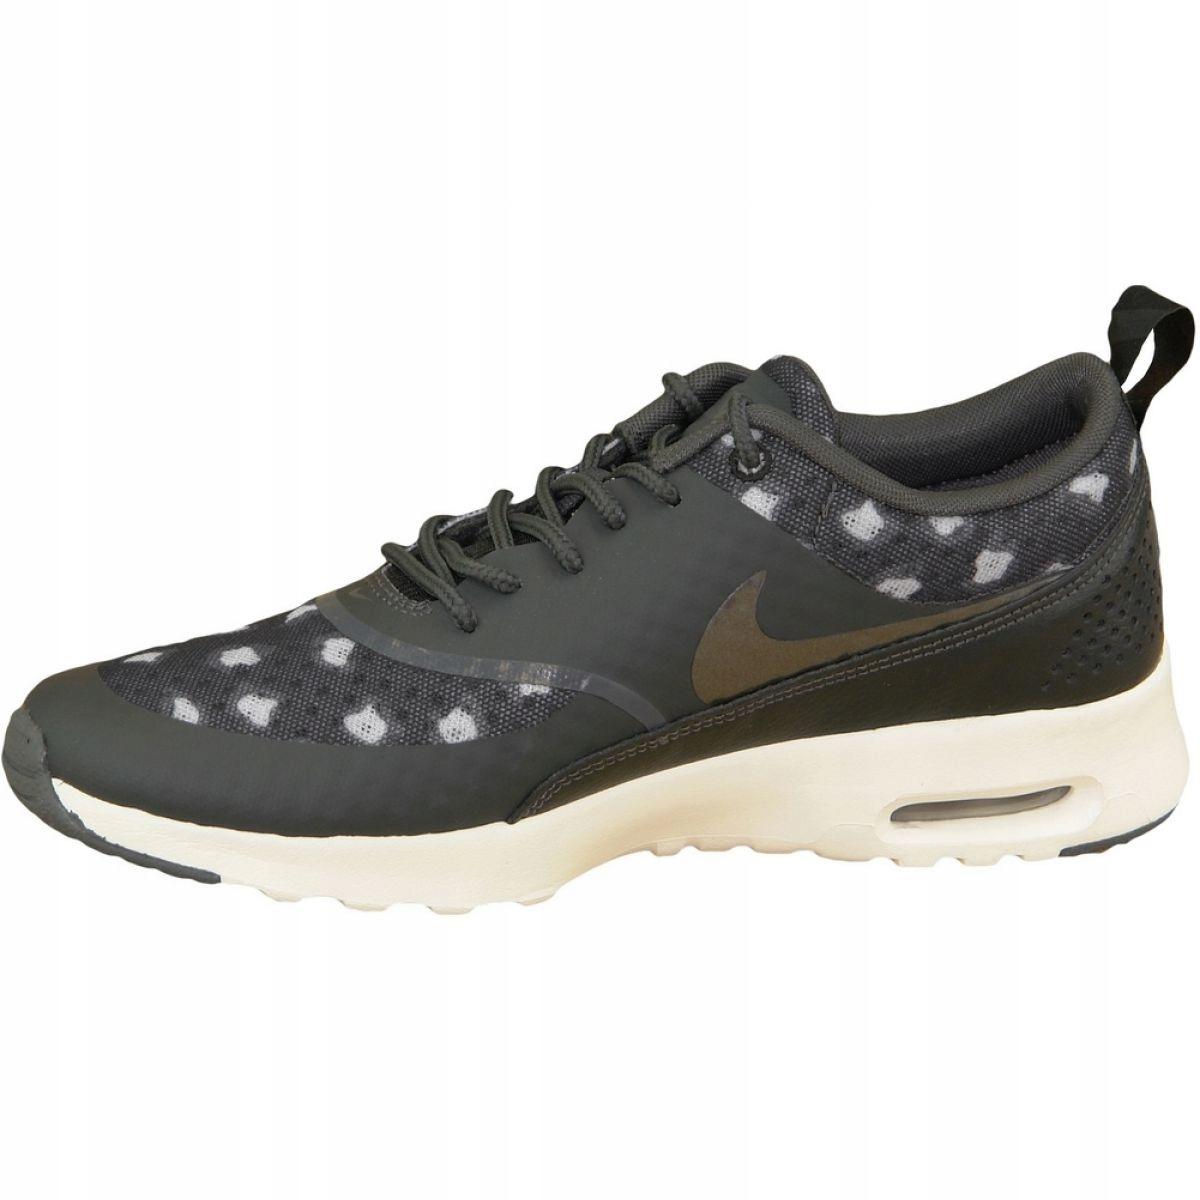 Svart Skor Nike Air Max Thea Premium W 599408 008